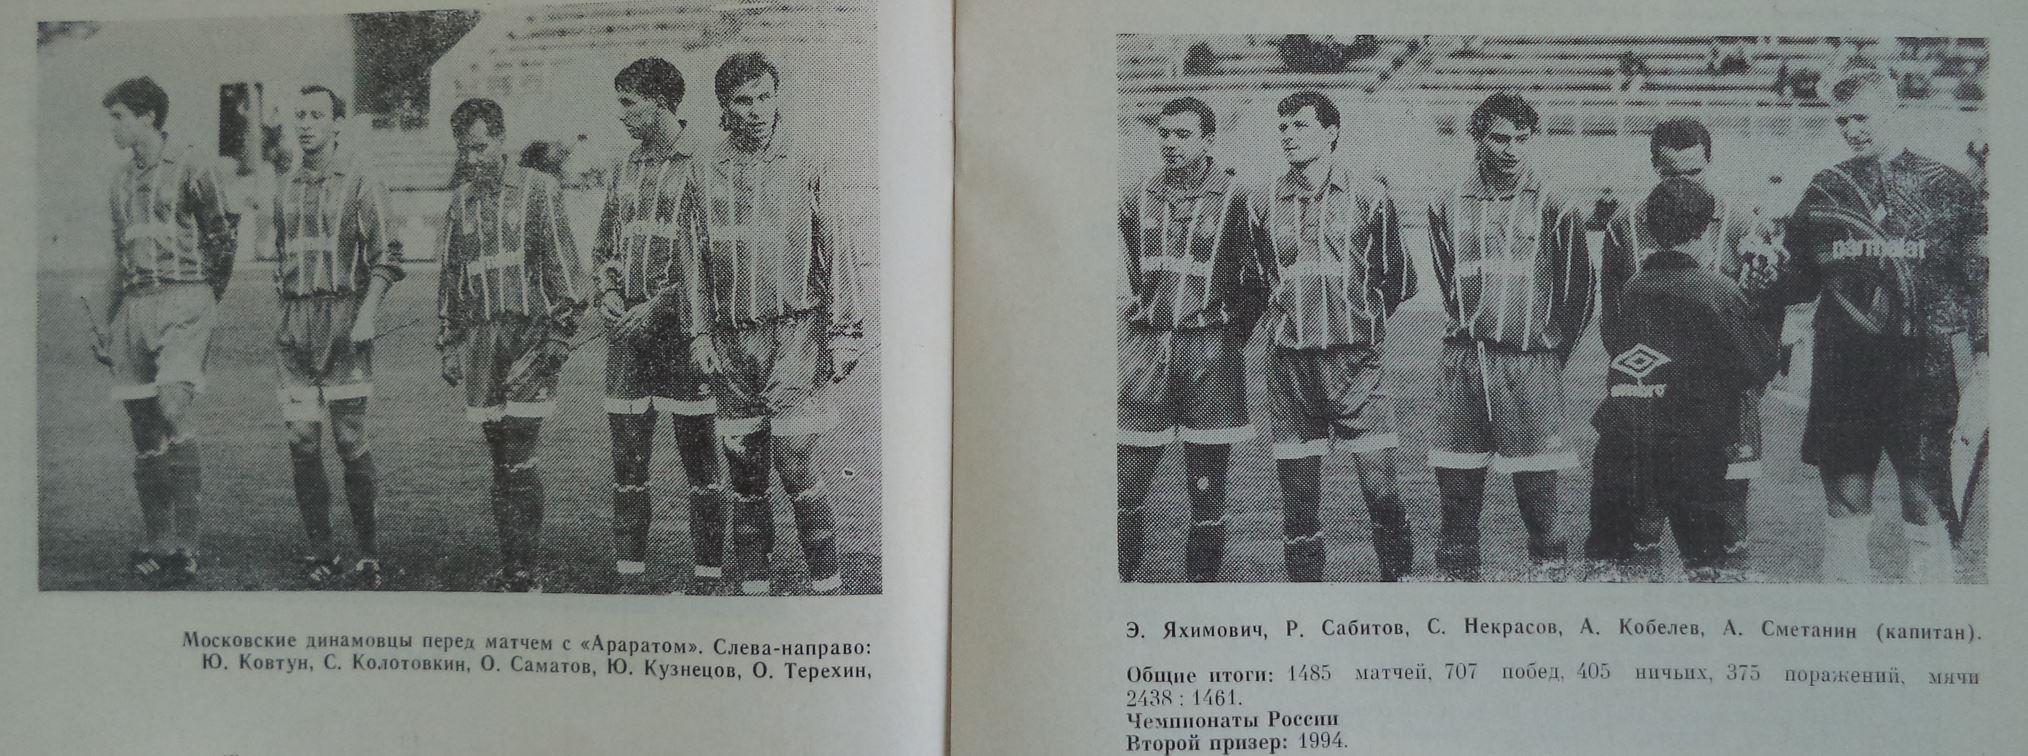 Динамо (Россия) - Арарат (Армения) 3:1